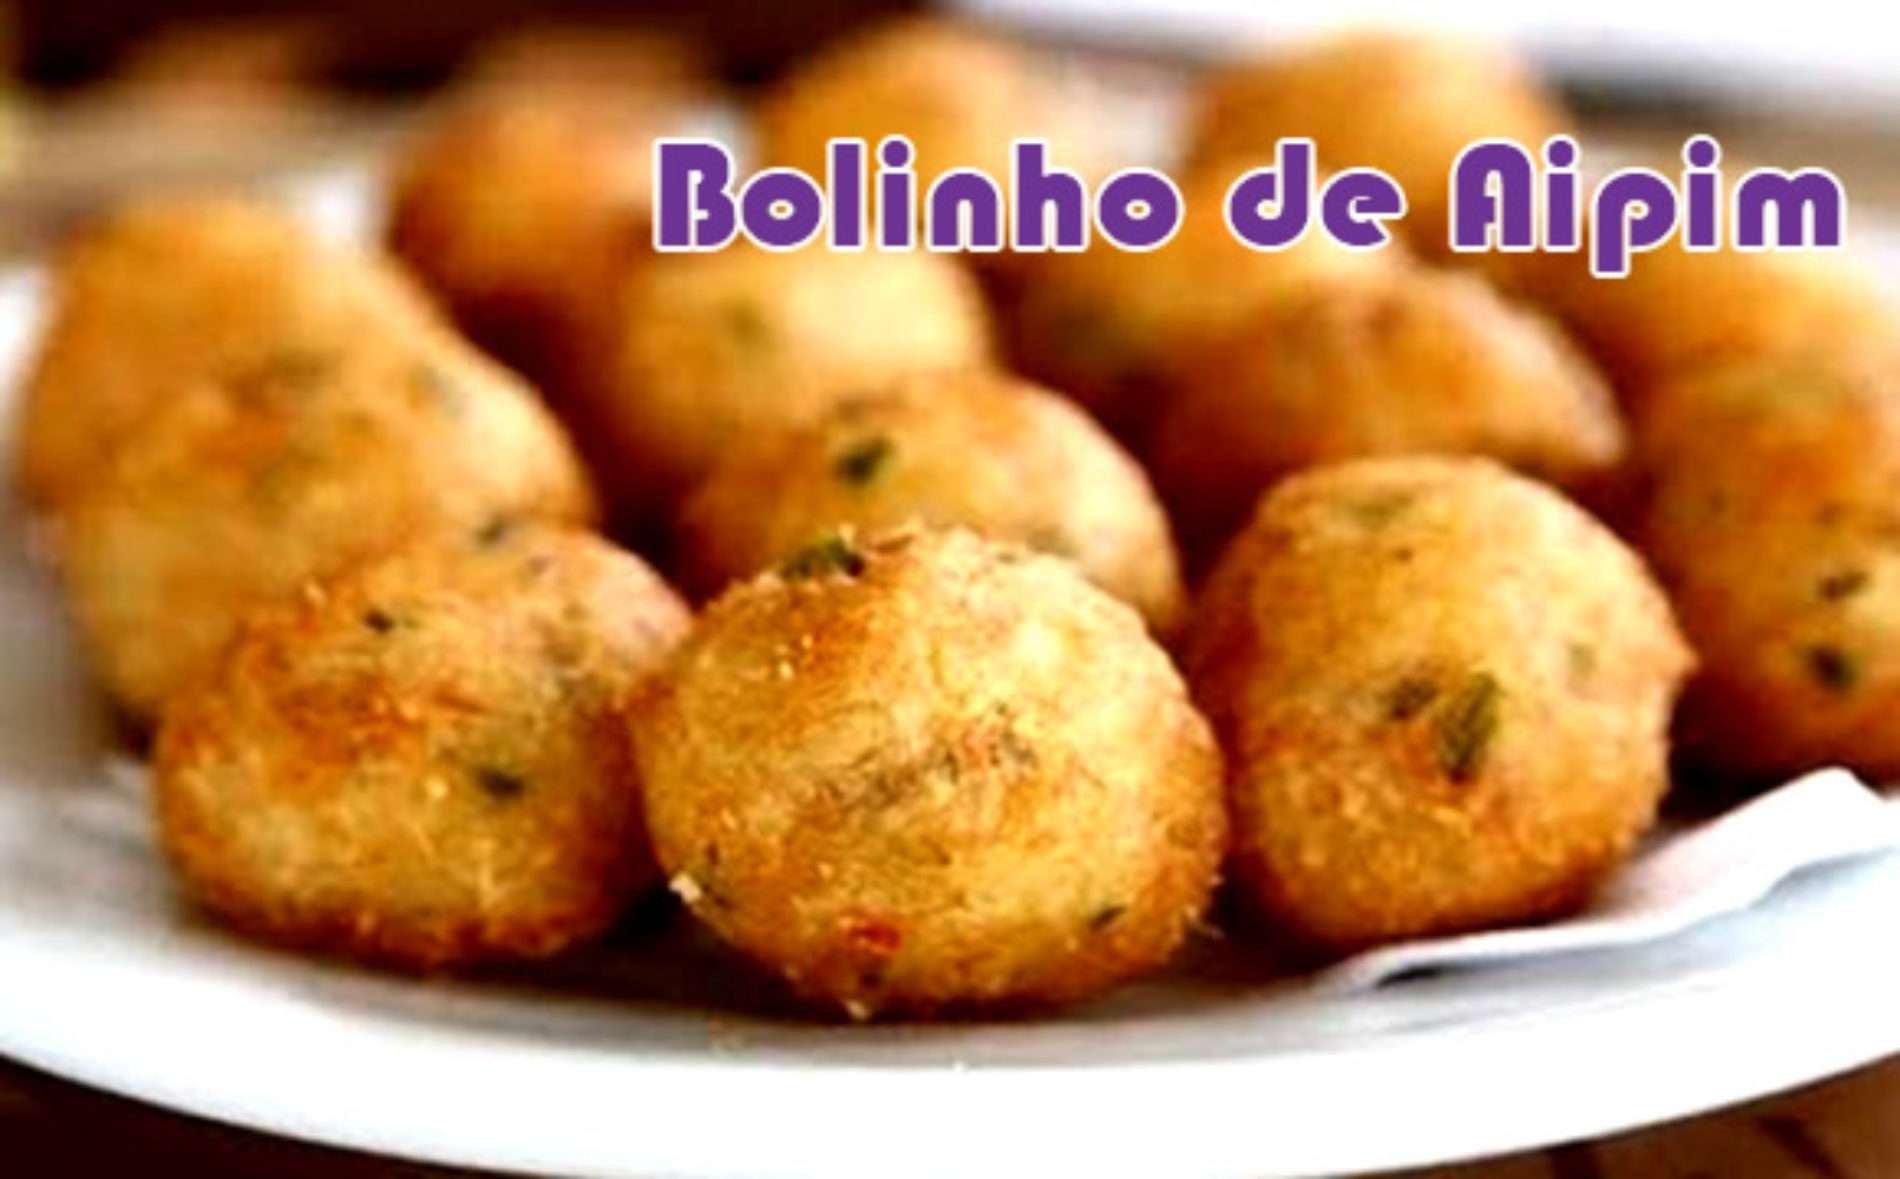 Bolinho de Aipim Gracyanne Barbosa